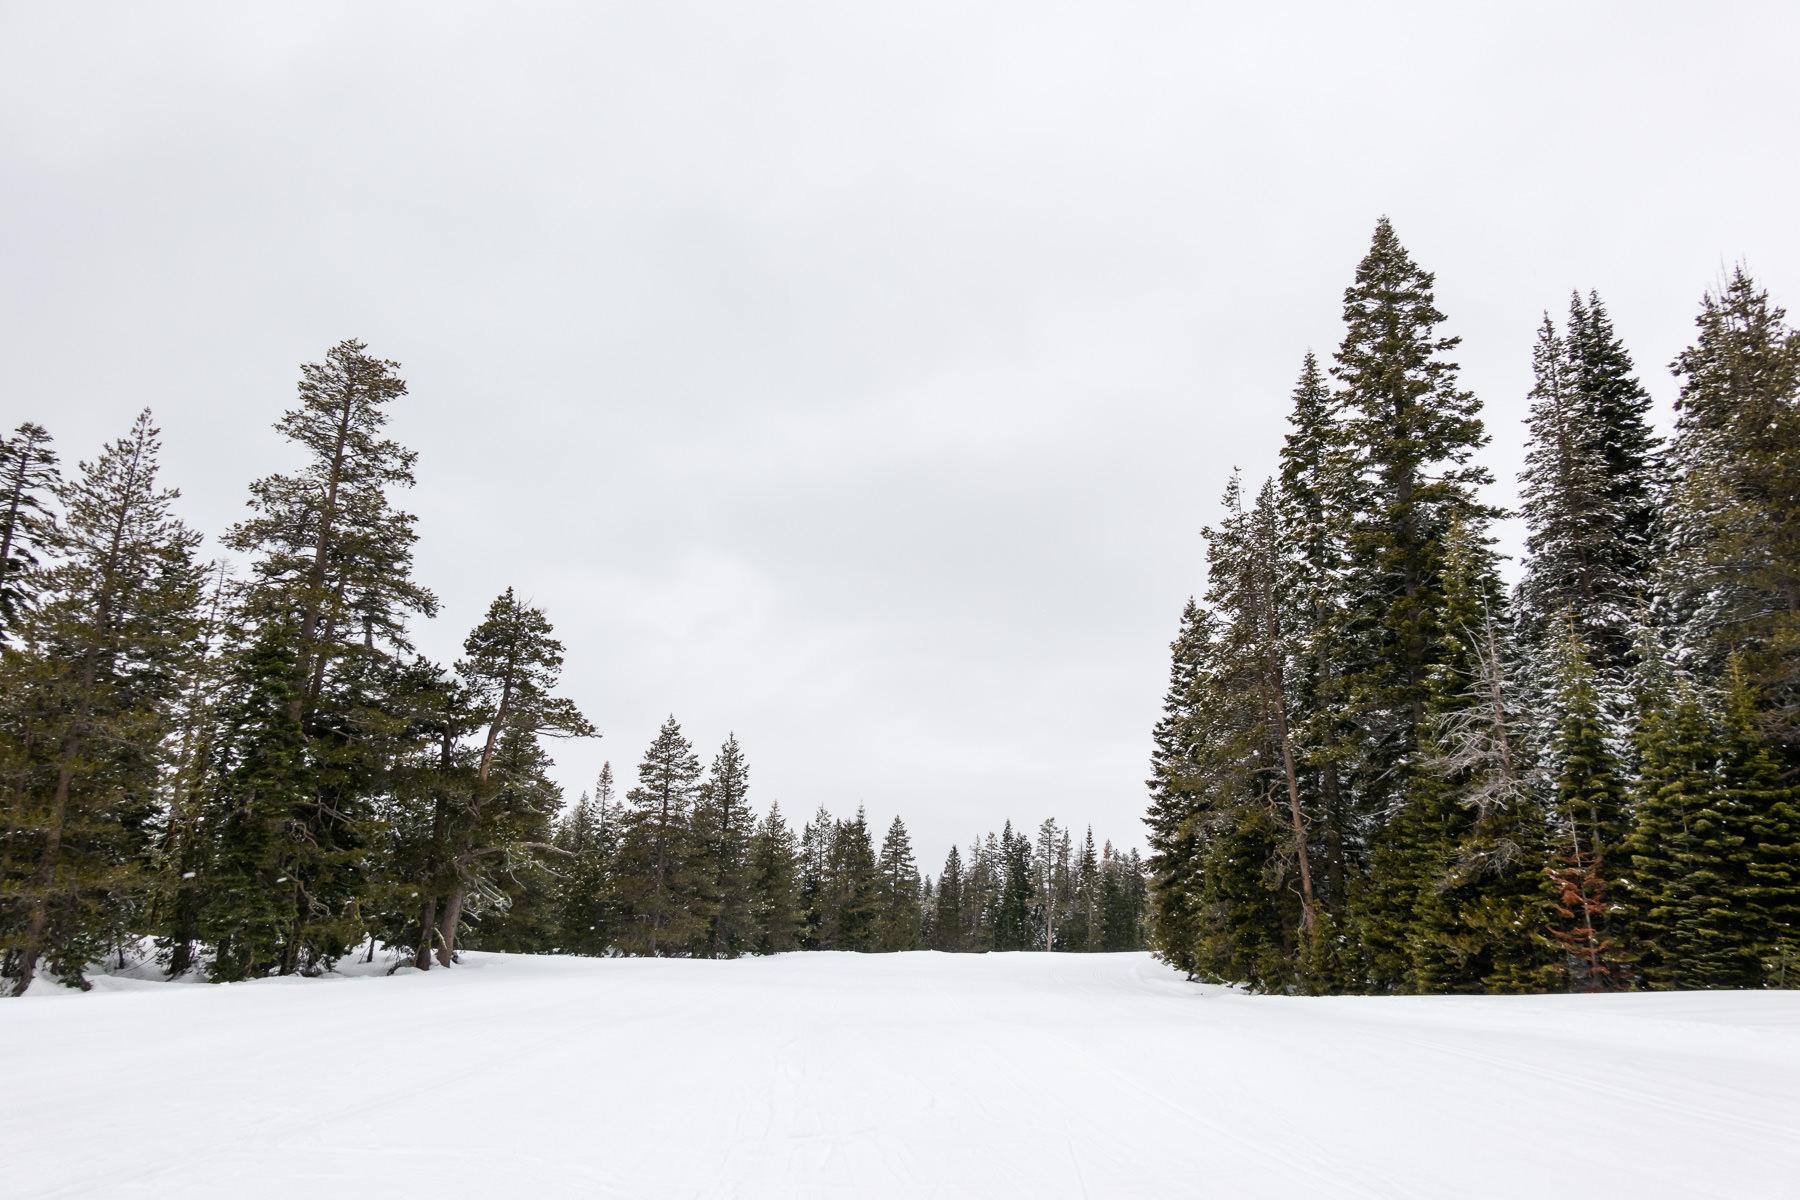 2019.03.22 Snowy Tahoe © Jennifer Carr Photography-2.jpg